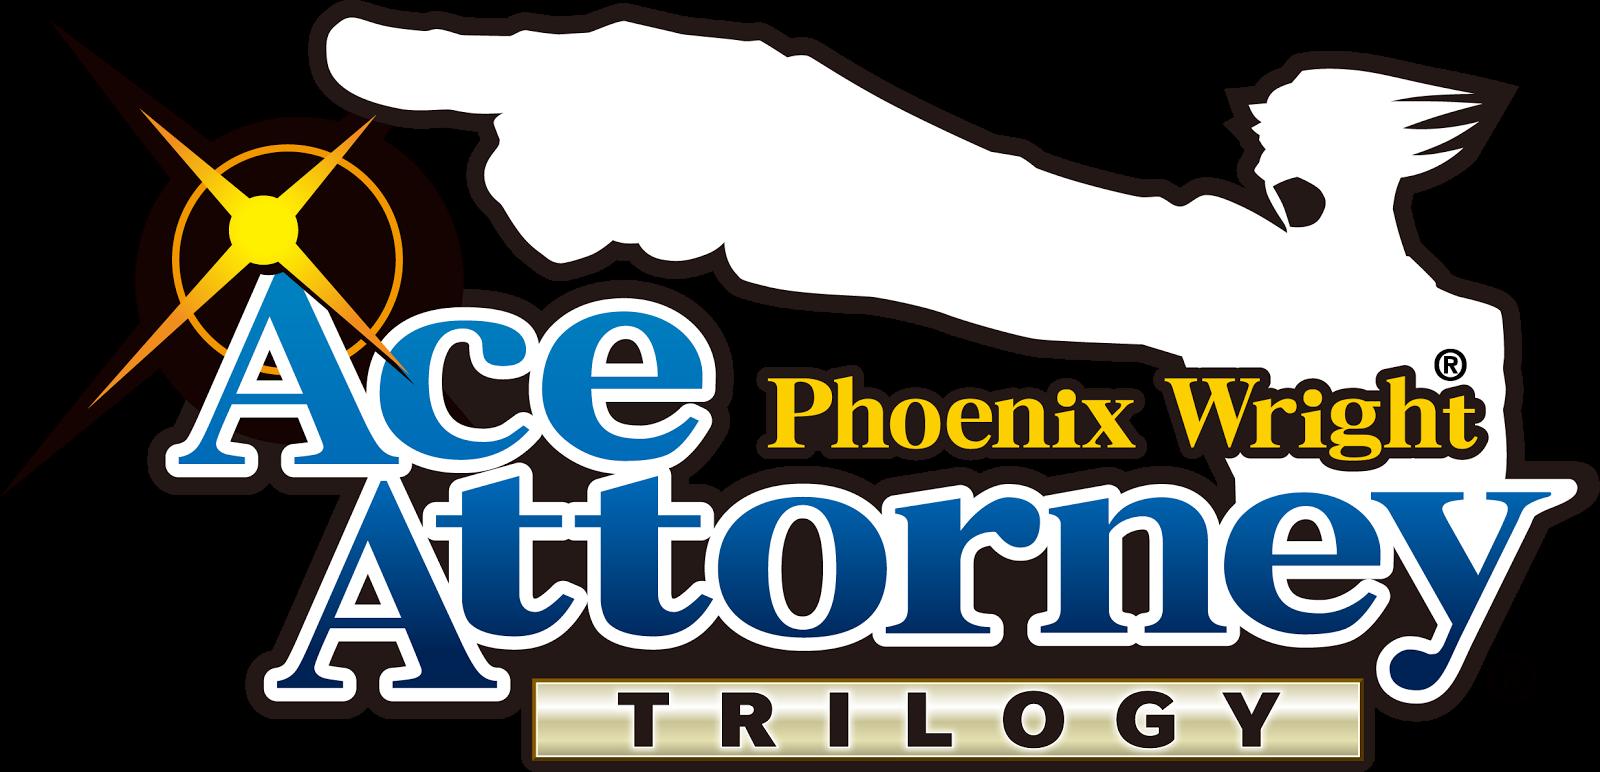 http://aceattorney.wikia.com/wiki/Phoenix_Wright:_Ace_Attorney_Trilogy